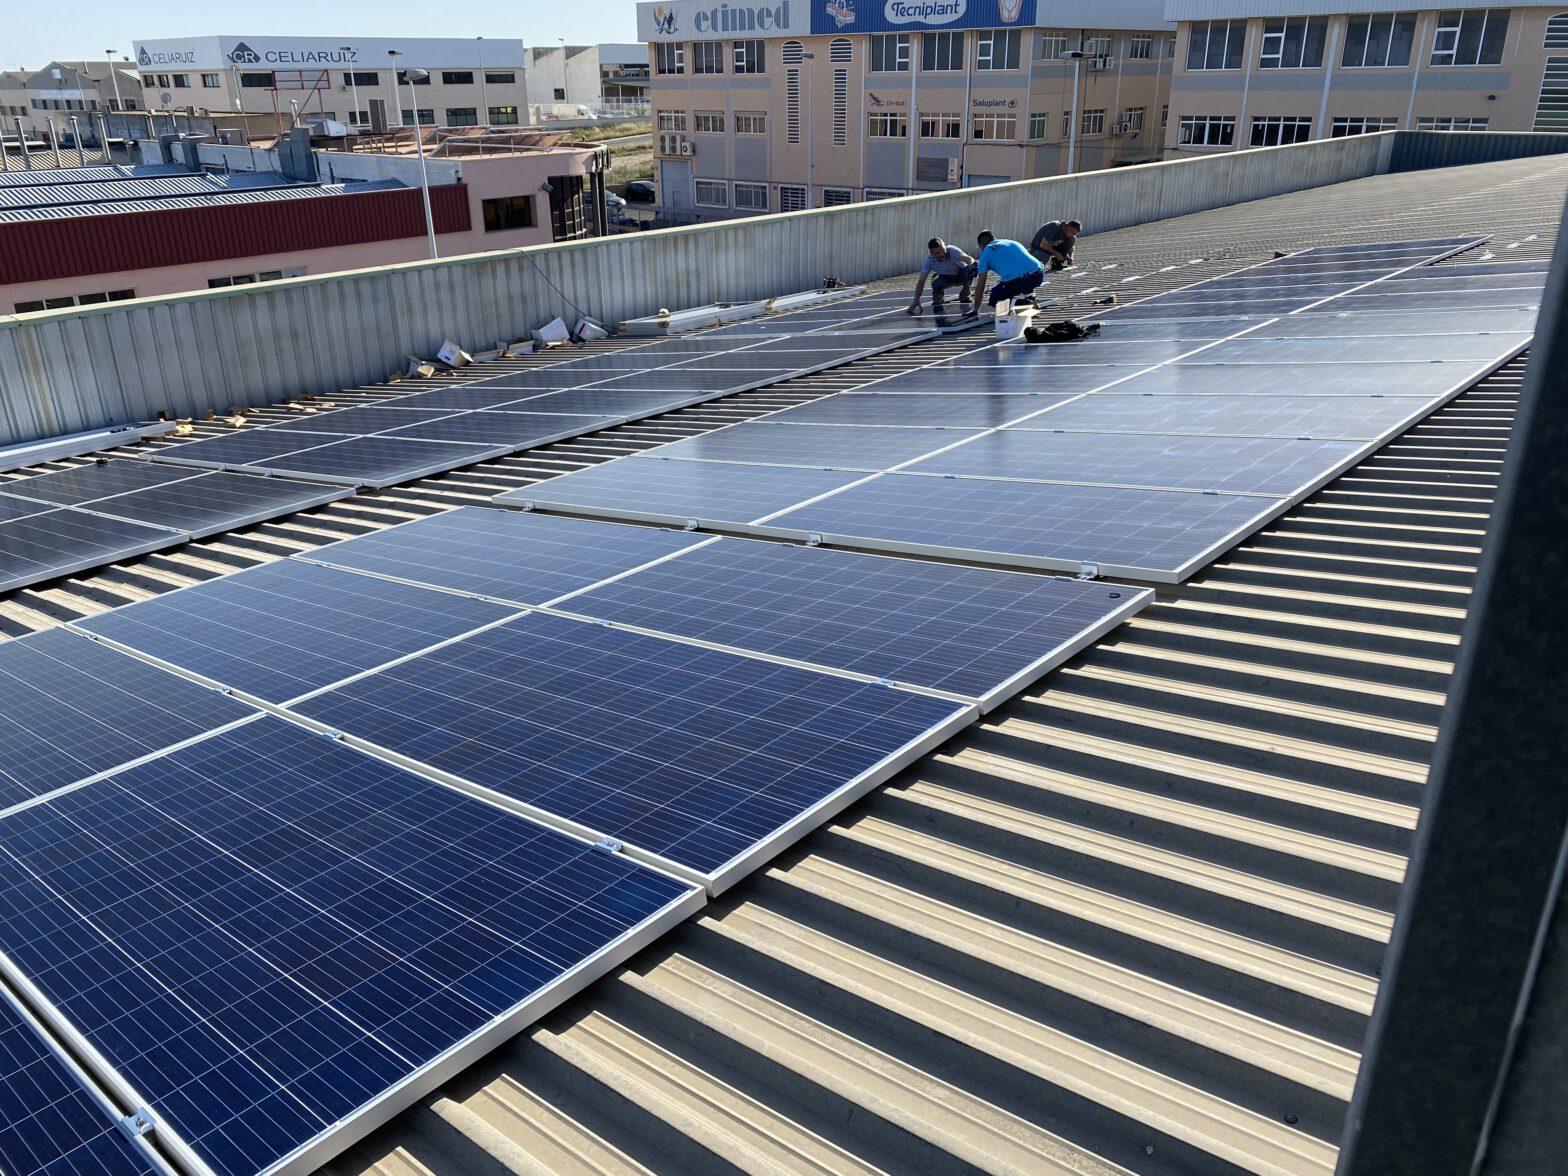 instalaciones energéticas jd